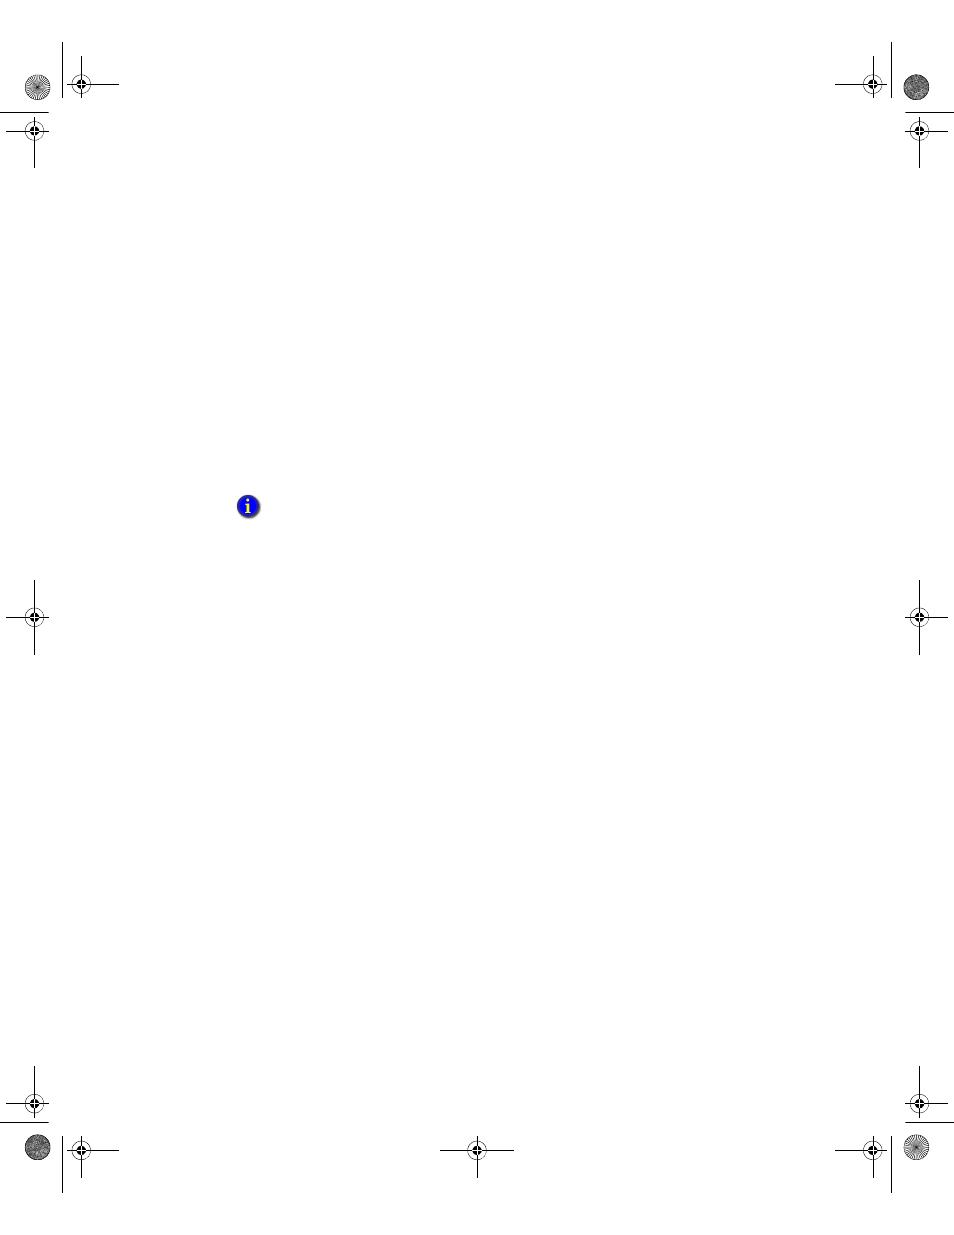 factorytalk activation connectivity rslinx enterprise rockwell rh manualsdir com RSLinx Device RSLinx Classic Lite 2.59